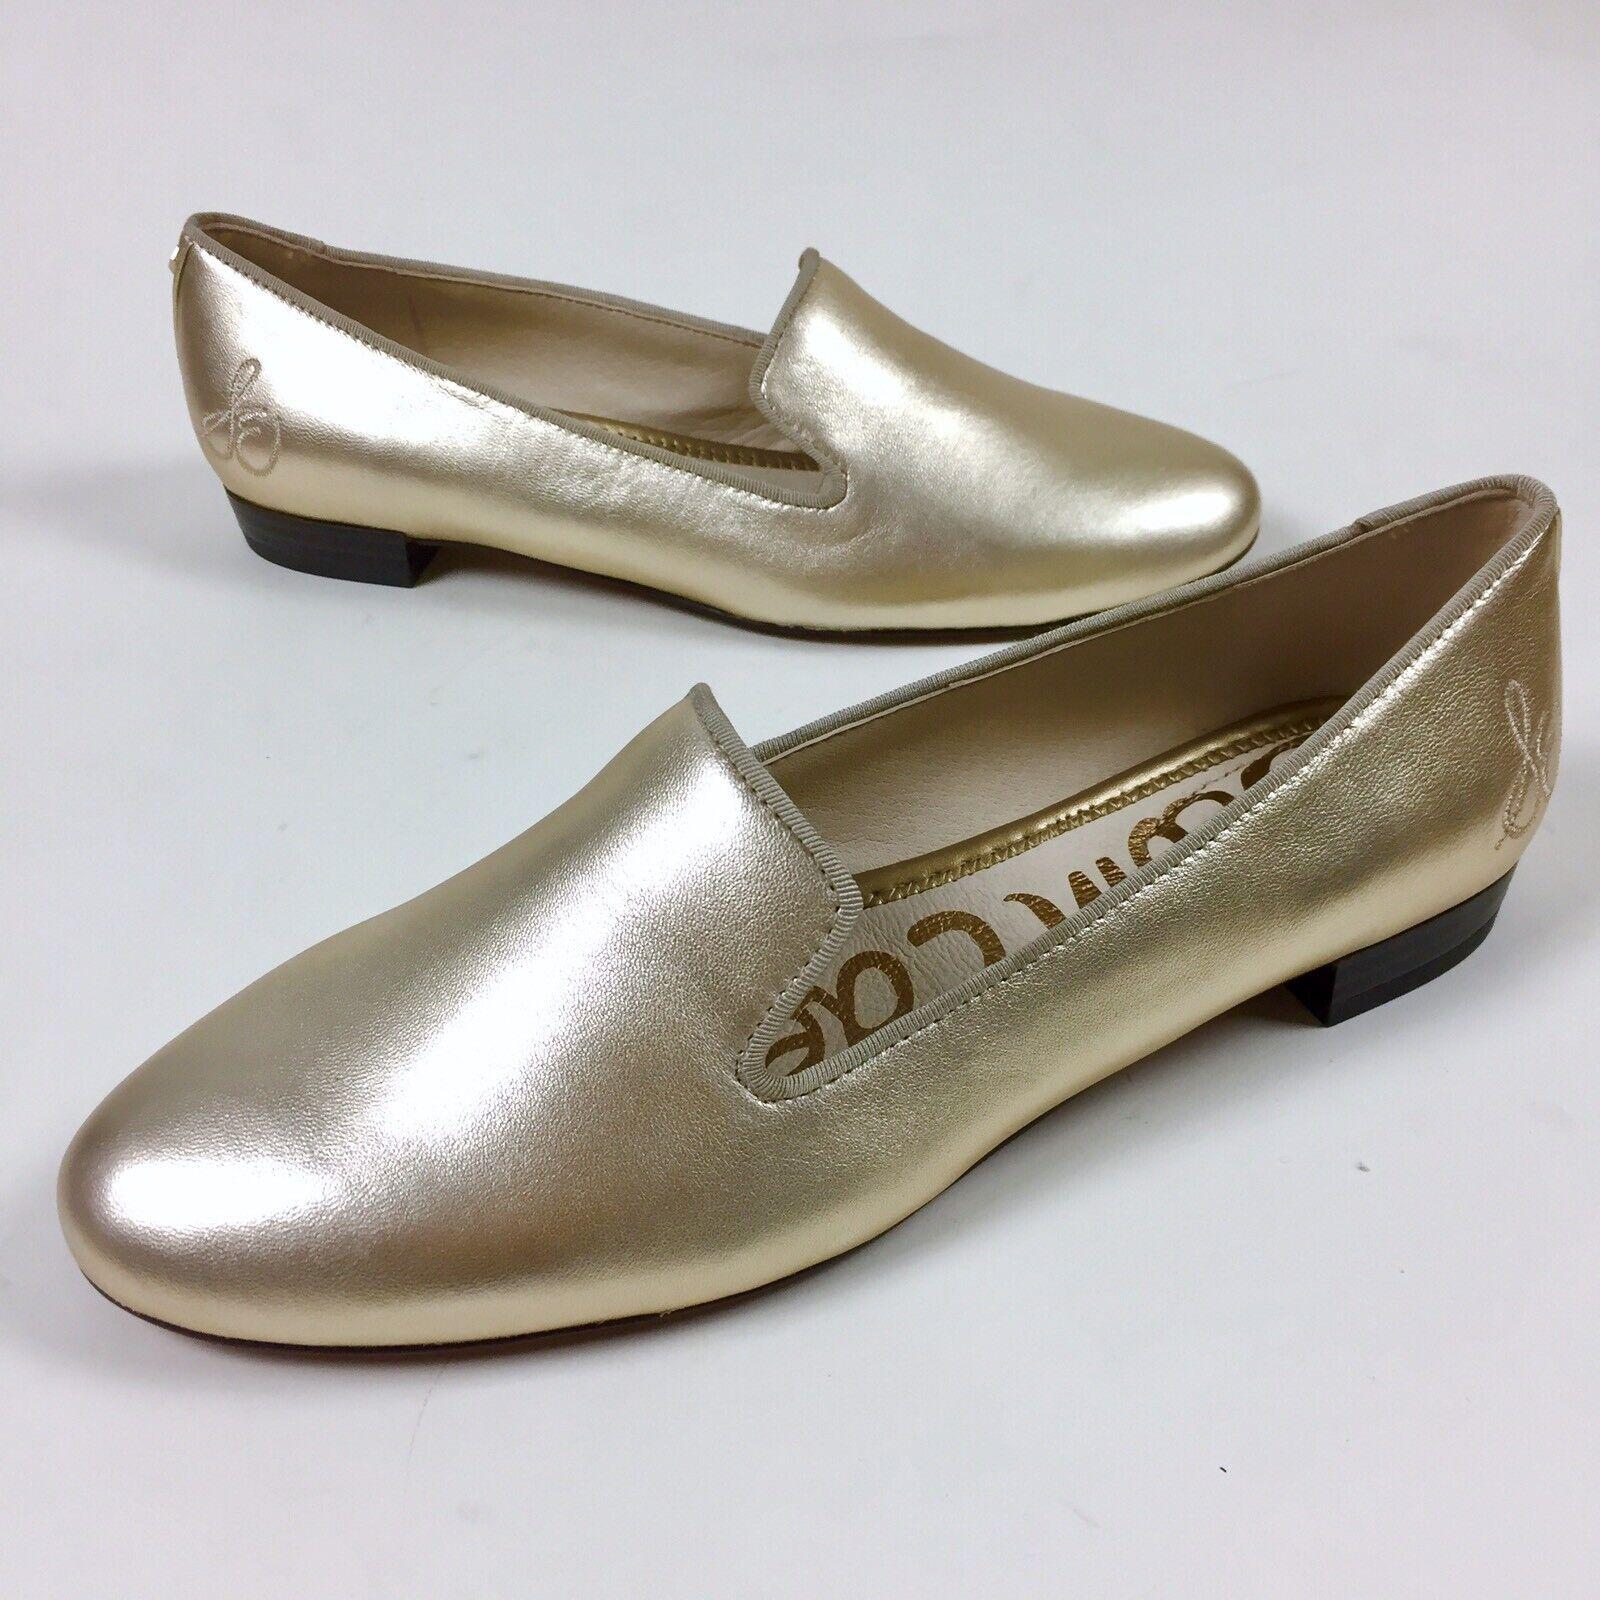 New Sam Edelman donna Butter Soft Soft Soft oro Leather Jordy Loafer Flats scarpe Dimensione 8M a317ad